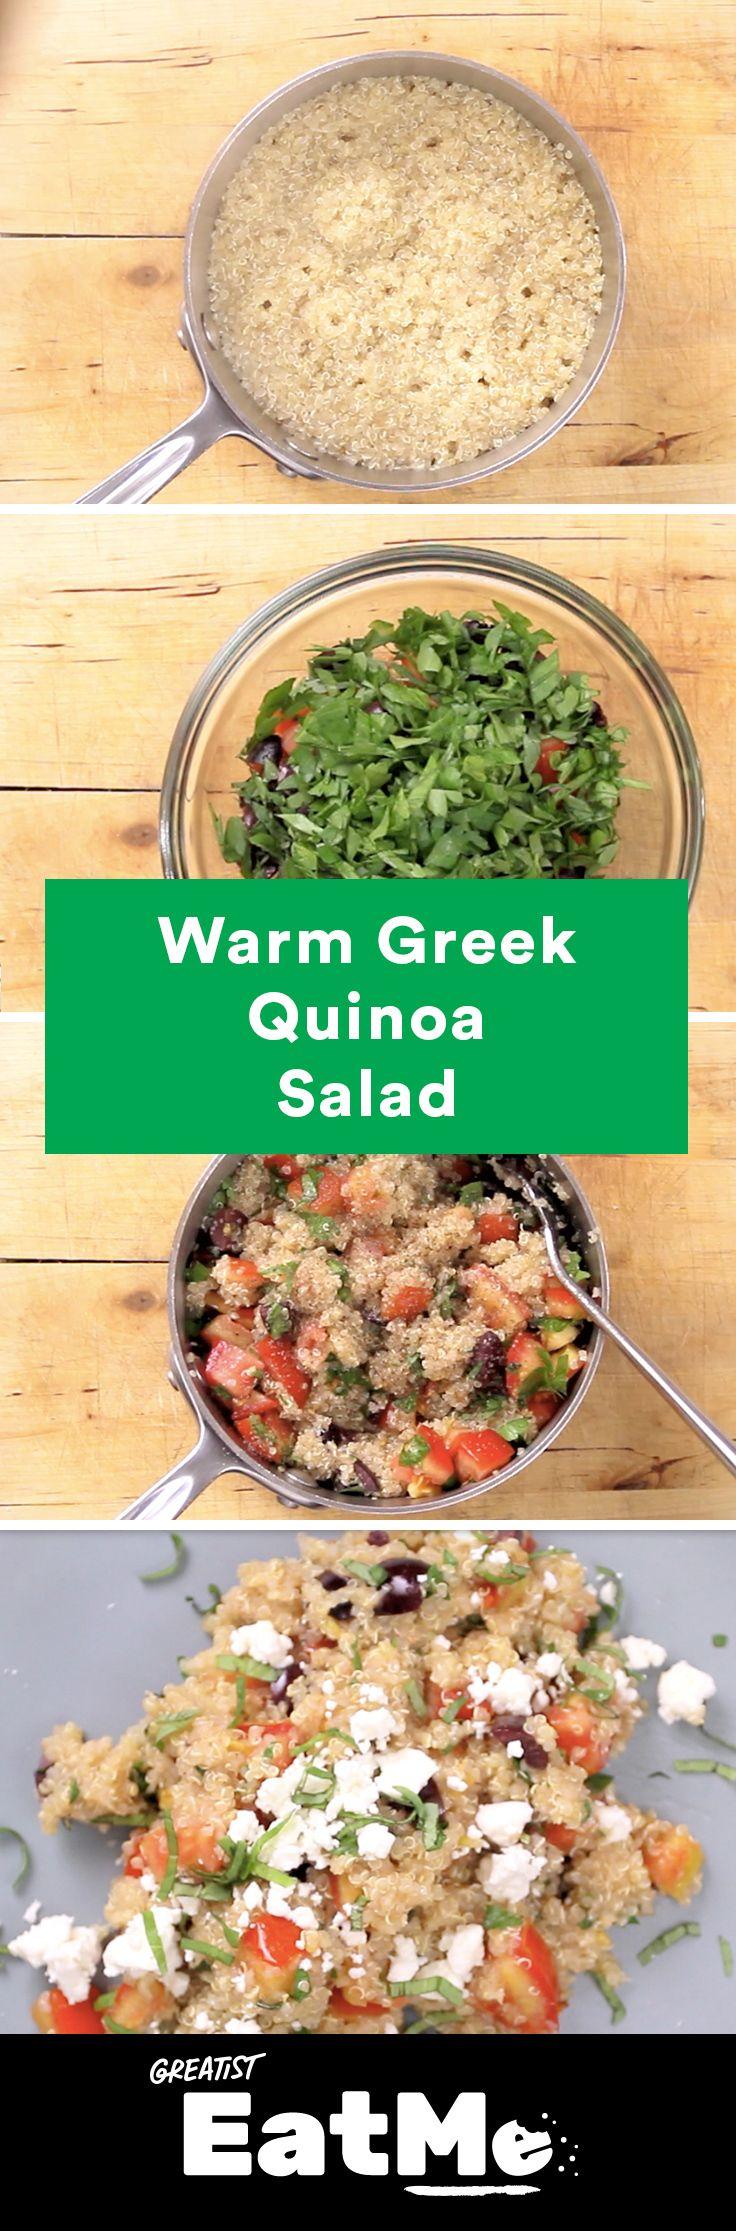 It's all Greek to us. #healthy #quinoa #salad http://greatist.com/eat/quinoa-salad-with-herbs-and-feta-recipe-video